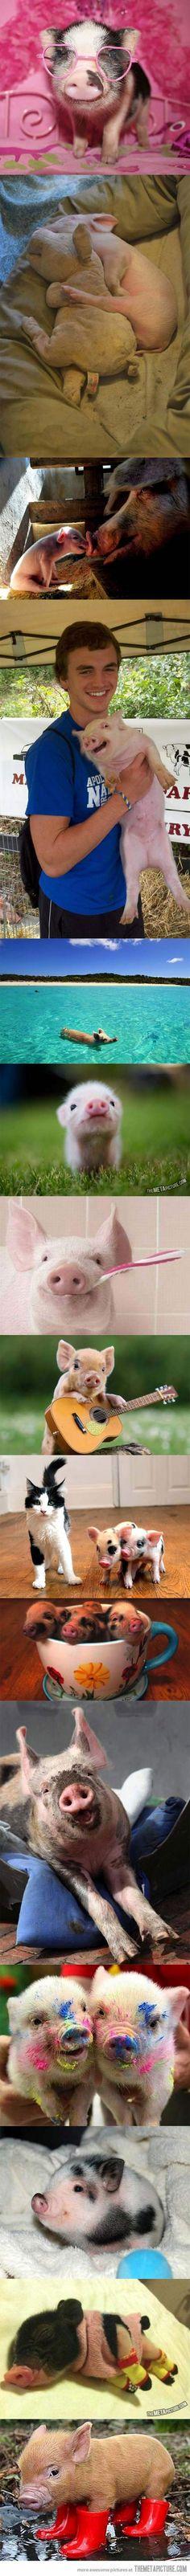 funny-piggy-bacon-little-cute